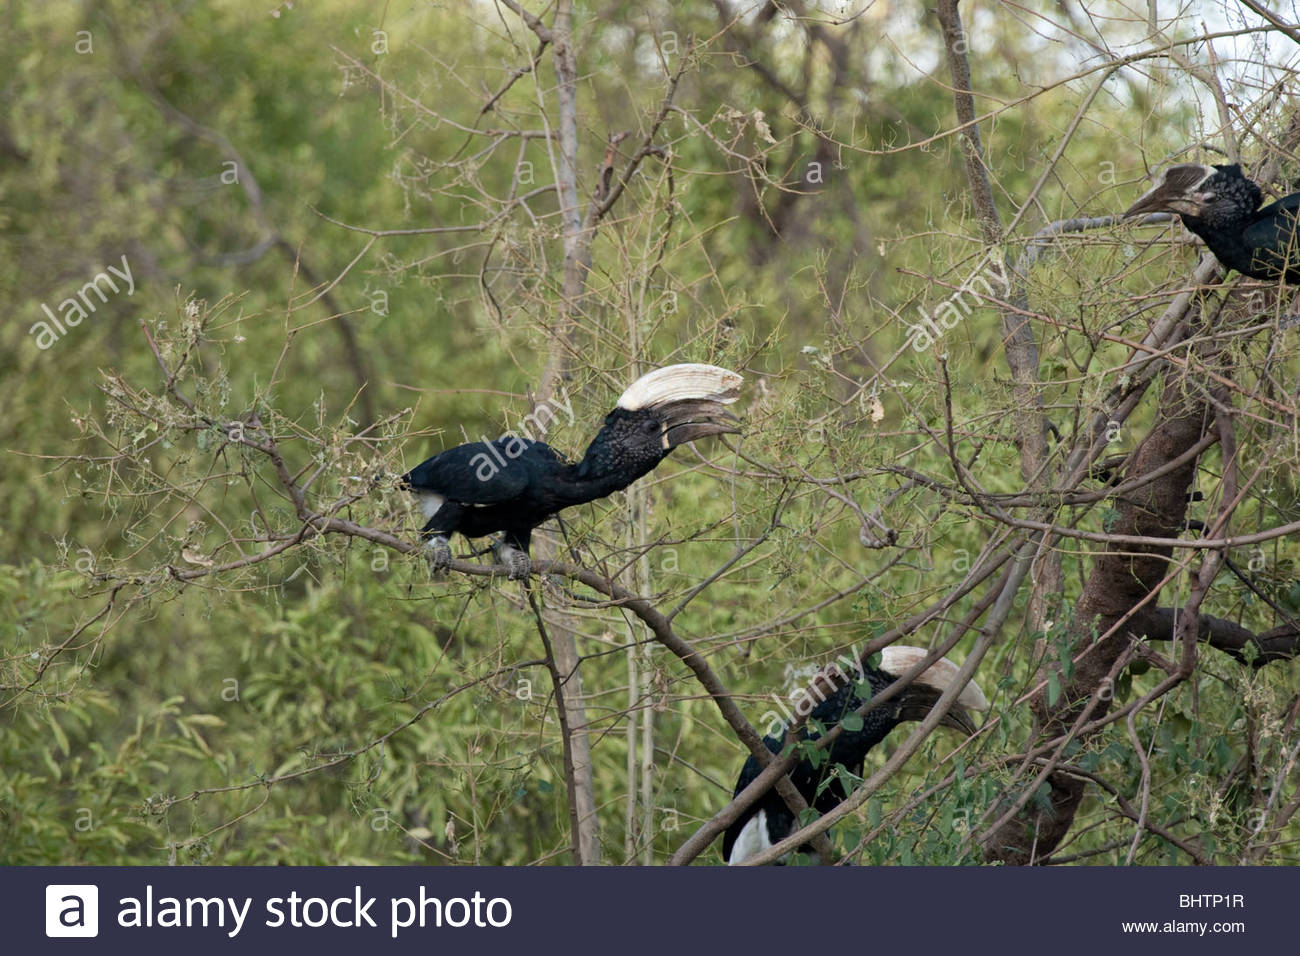 A male (center) Silvery-cheeked Hornbill at Lake Manyara National Park, Tanzania. - Stock Image